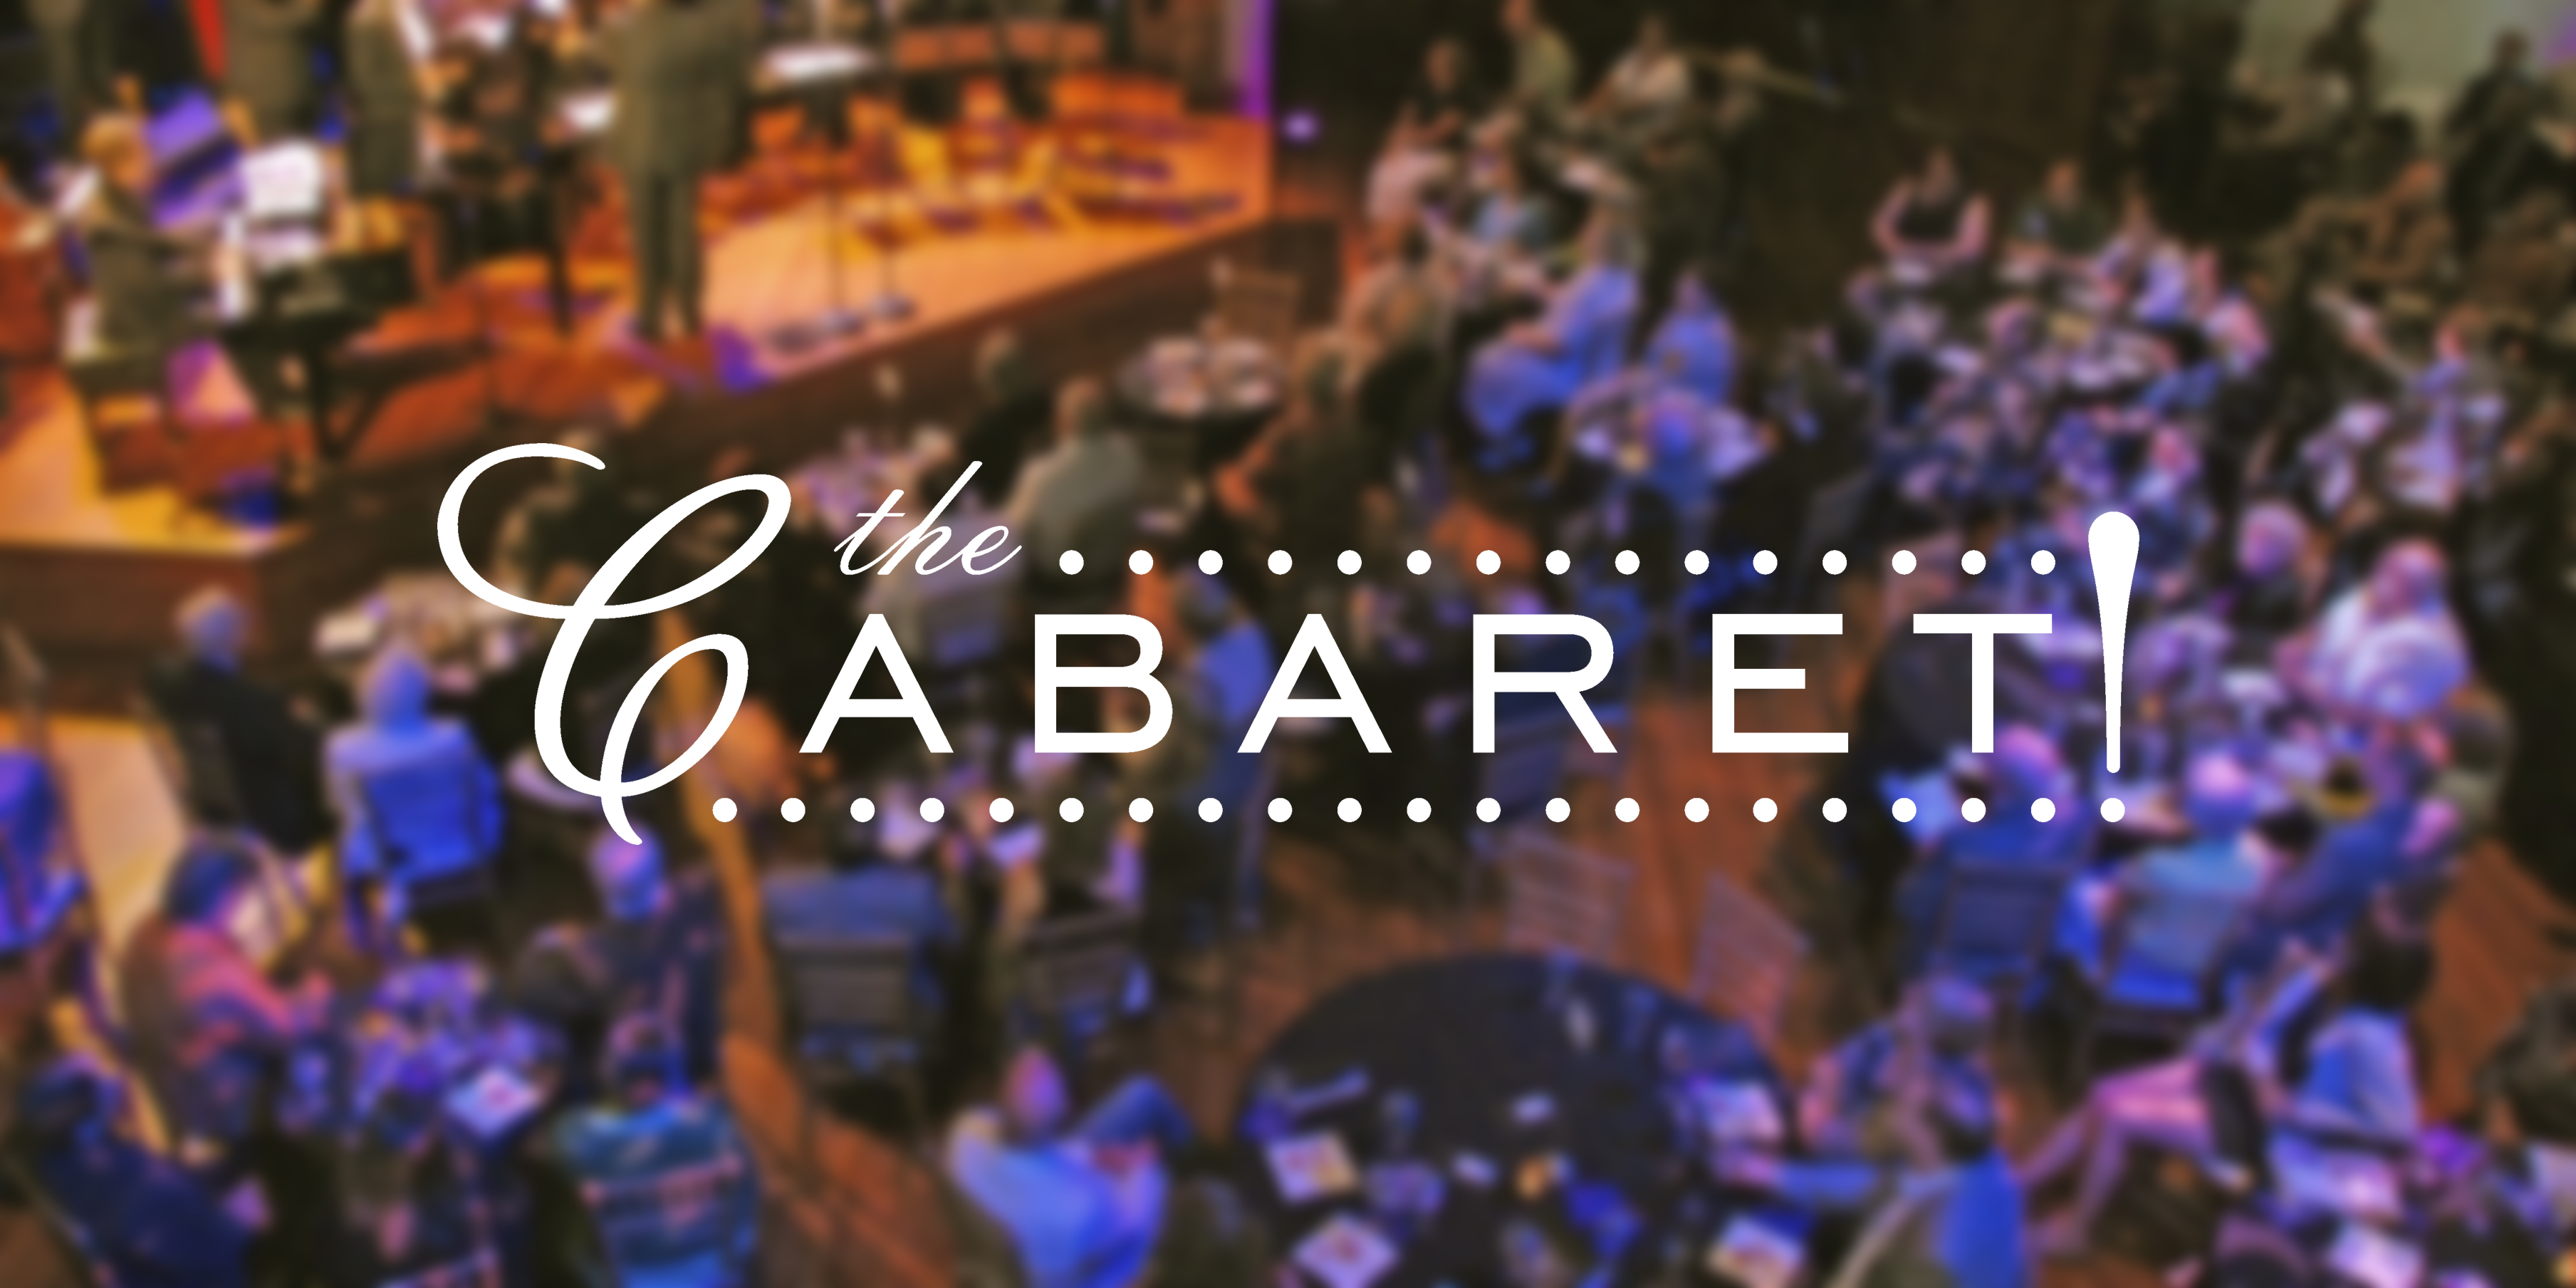 The Cabaret at Indiana Landmarks Center